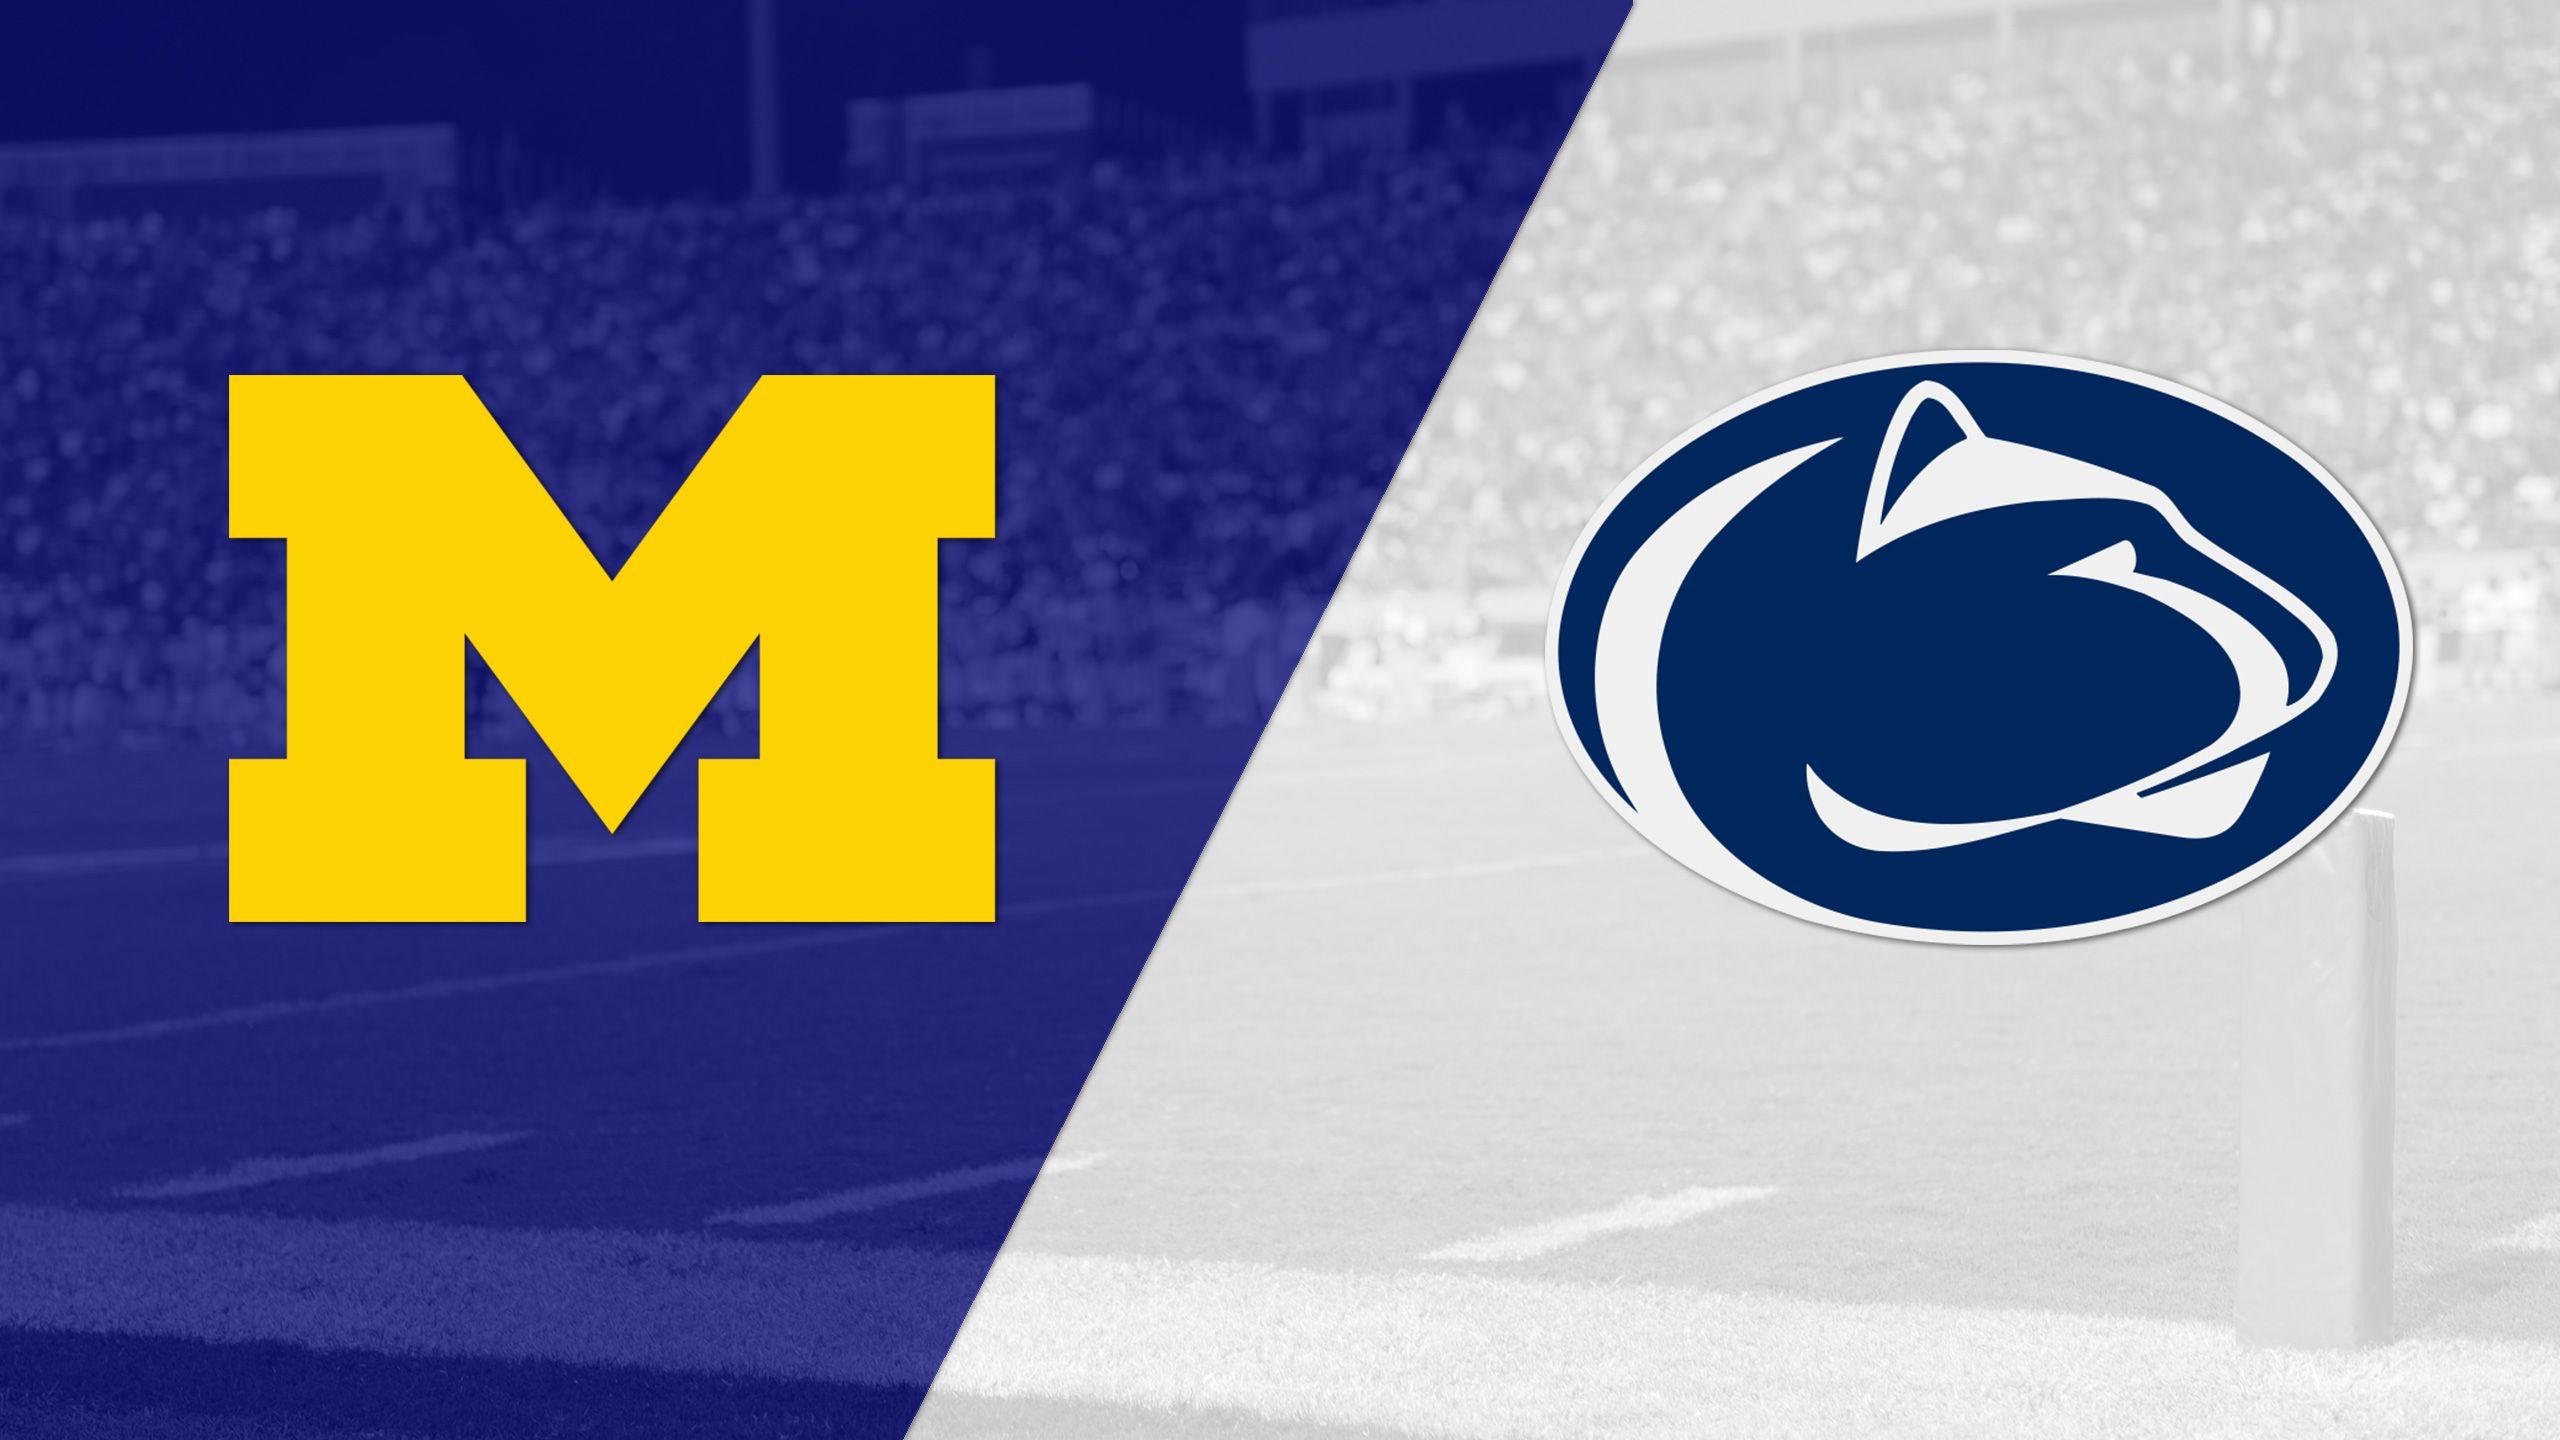 #19 Michigan vs. #2 Penn State (Football) (re-air)